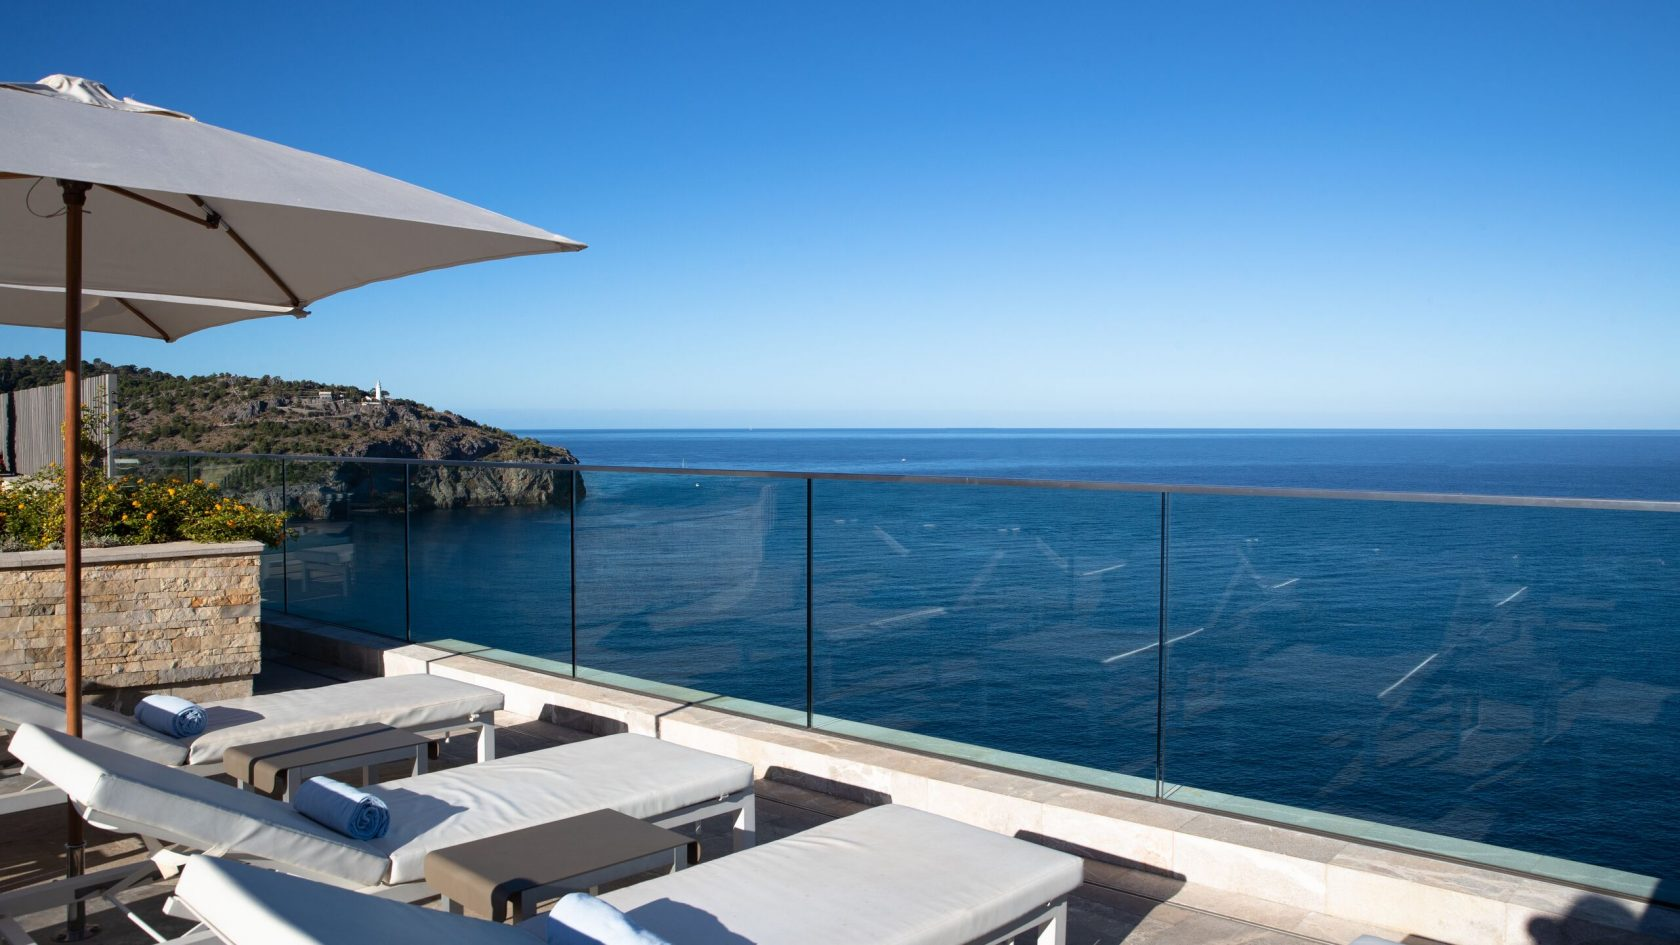 Jumeirah Port Soller Hotel & Spa – Port Sollér, Mallorca